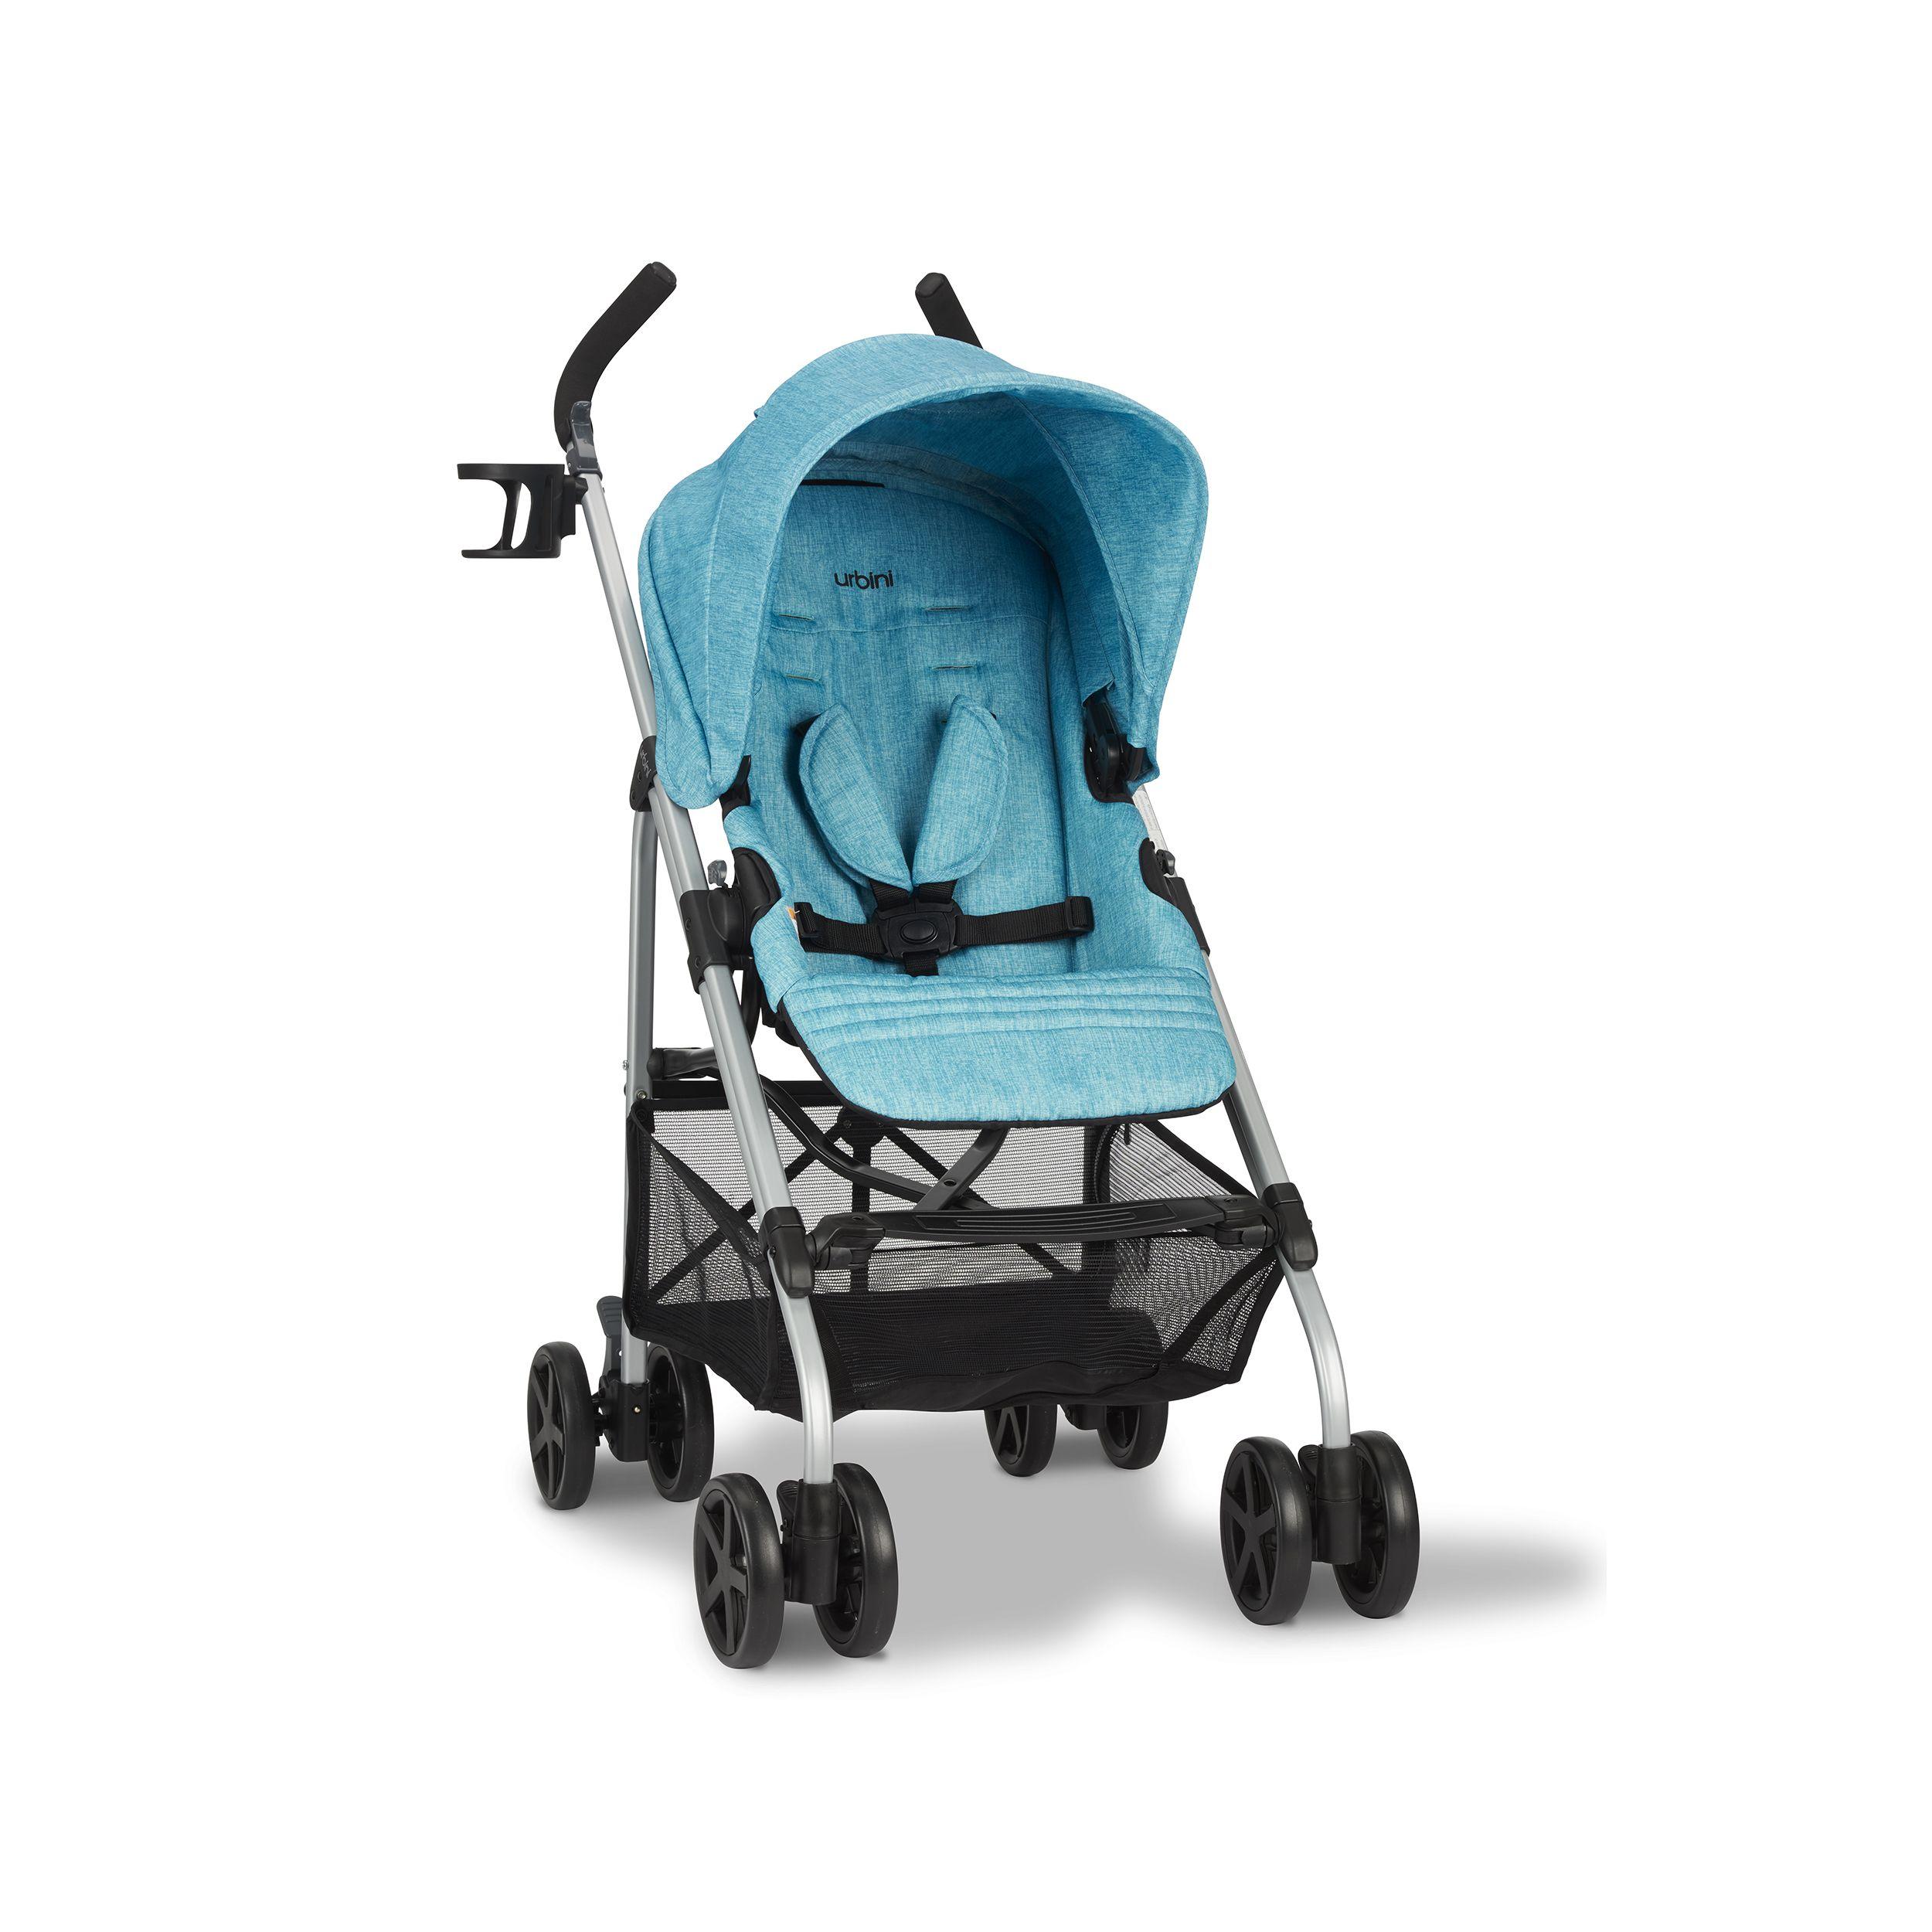 Baby Baby car seats, Baby strollers, Umbrella stroller